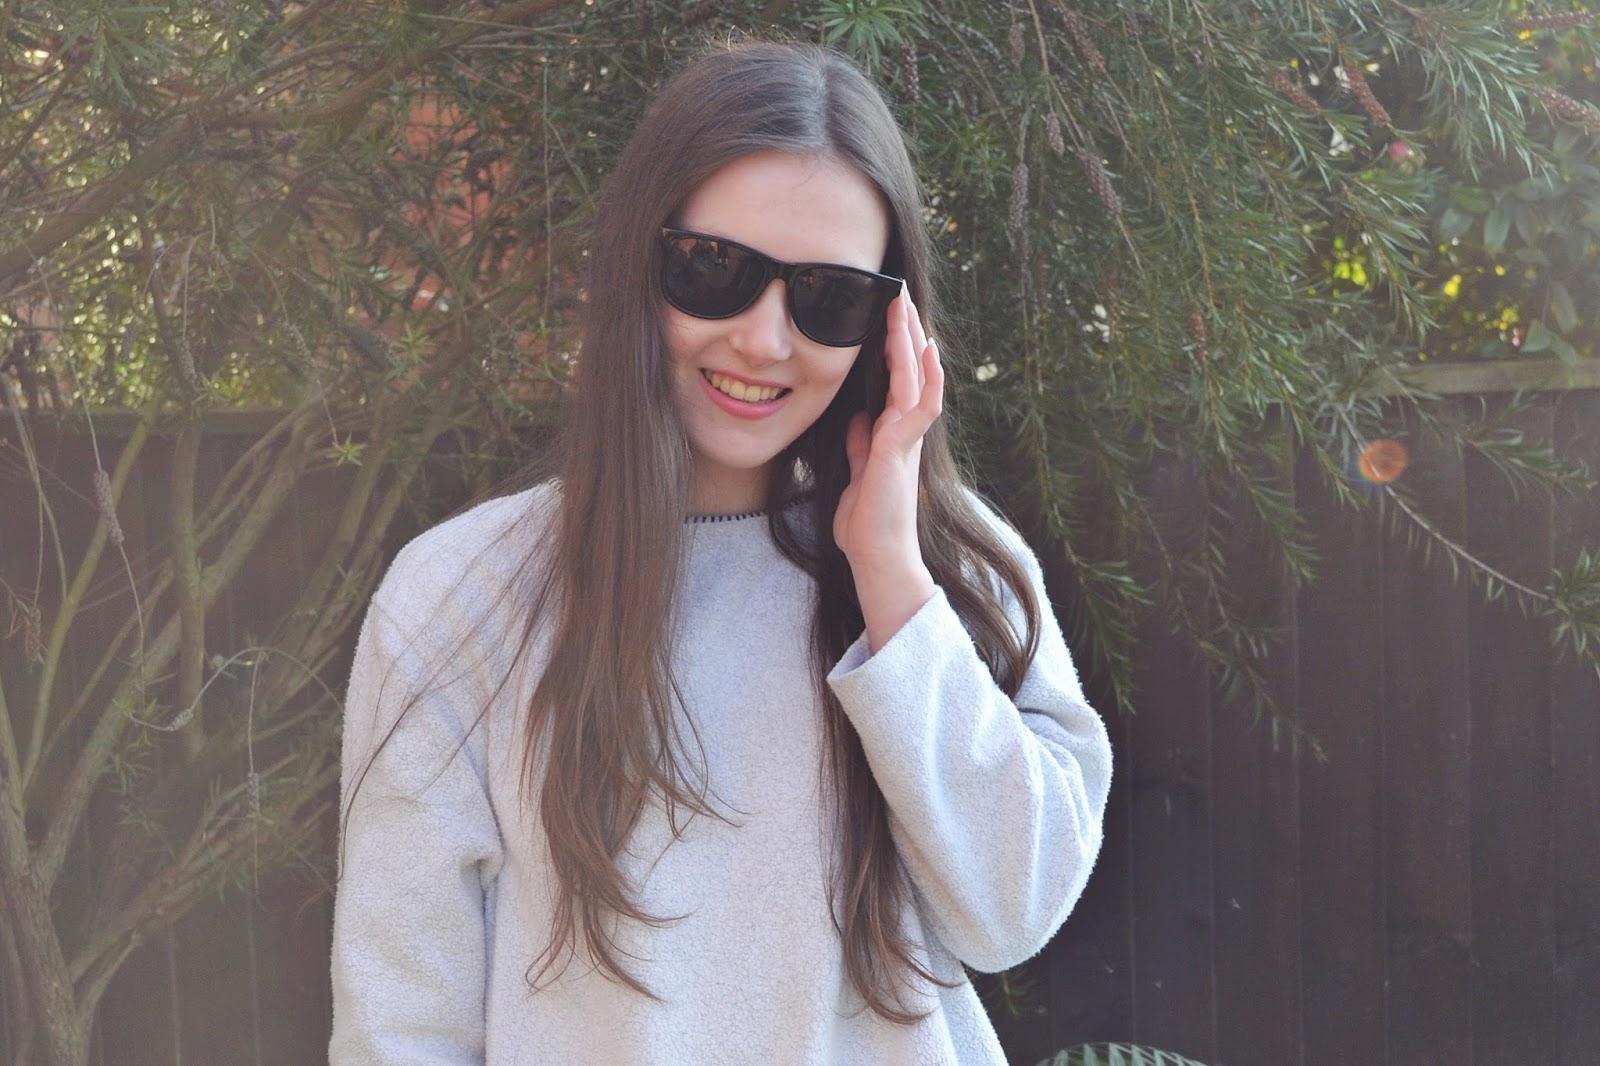 lunar look sunglasses smile